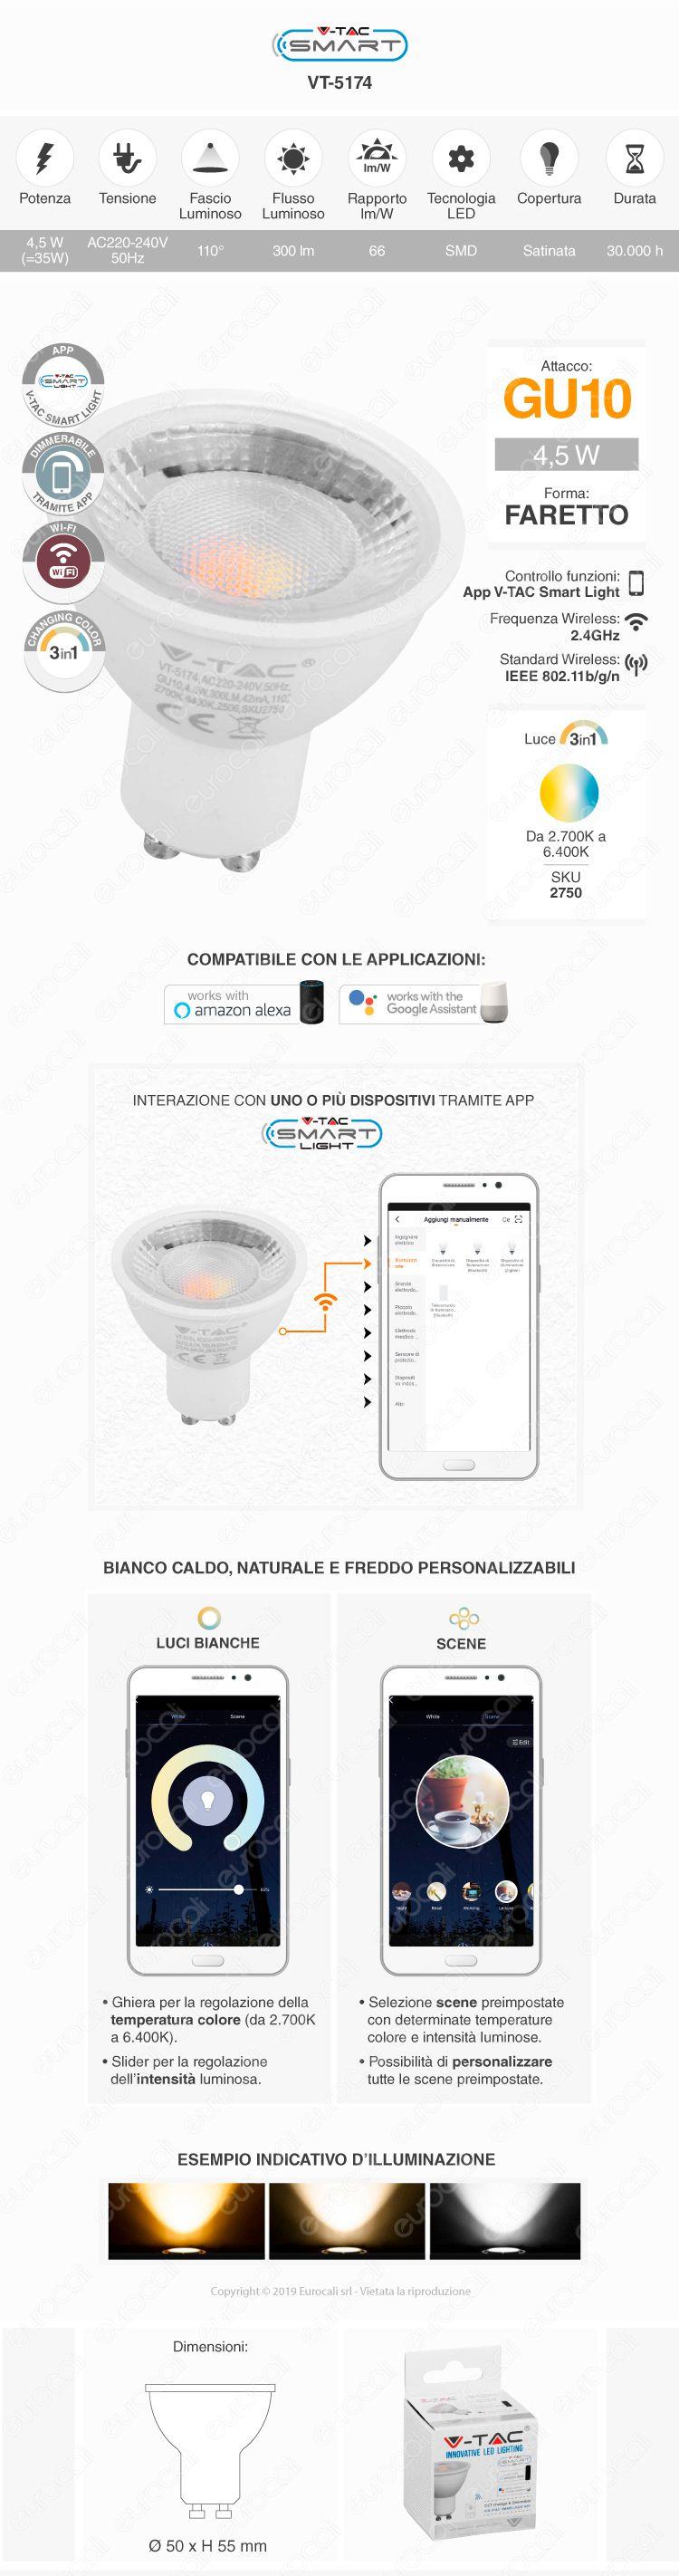 V-Tac Smart VT-5174 Lampadina LED Wi-Fi Faretto GU10 4,5W CCT Dimmerabile